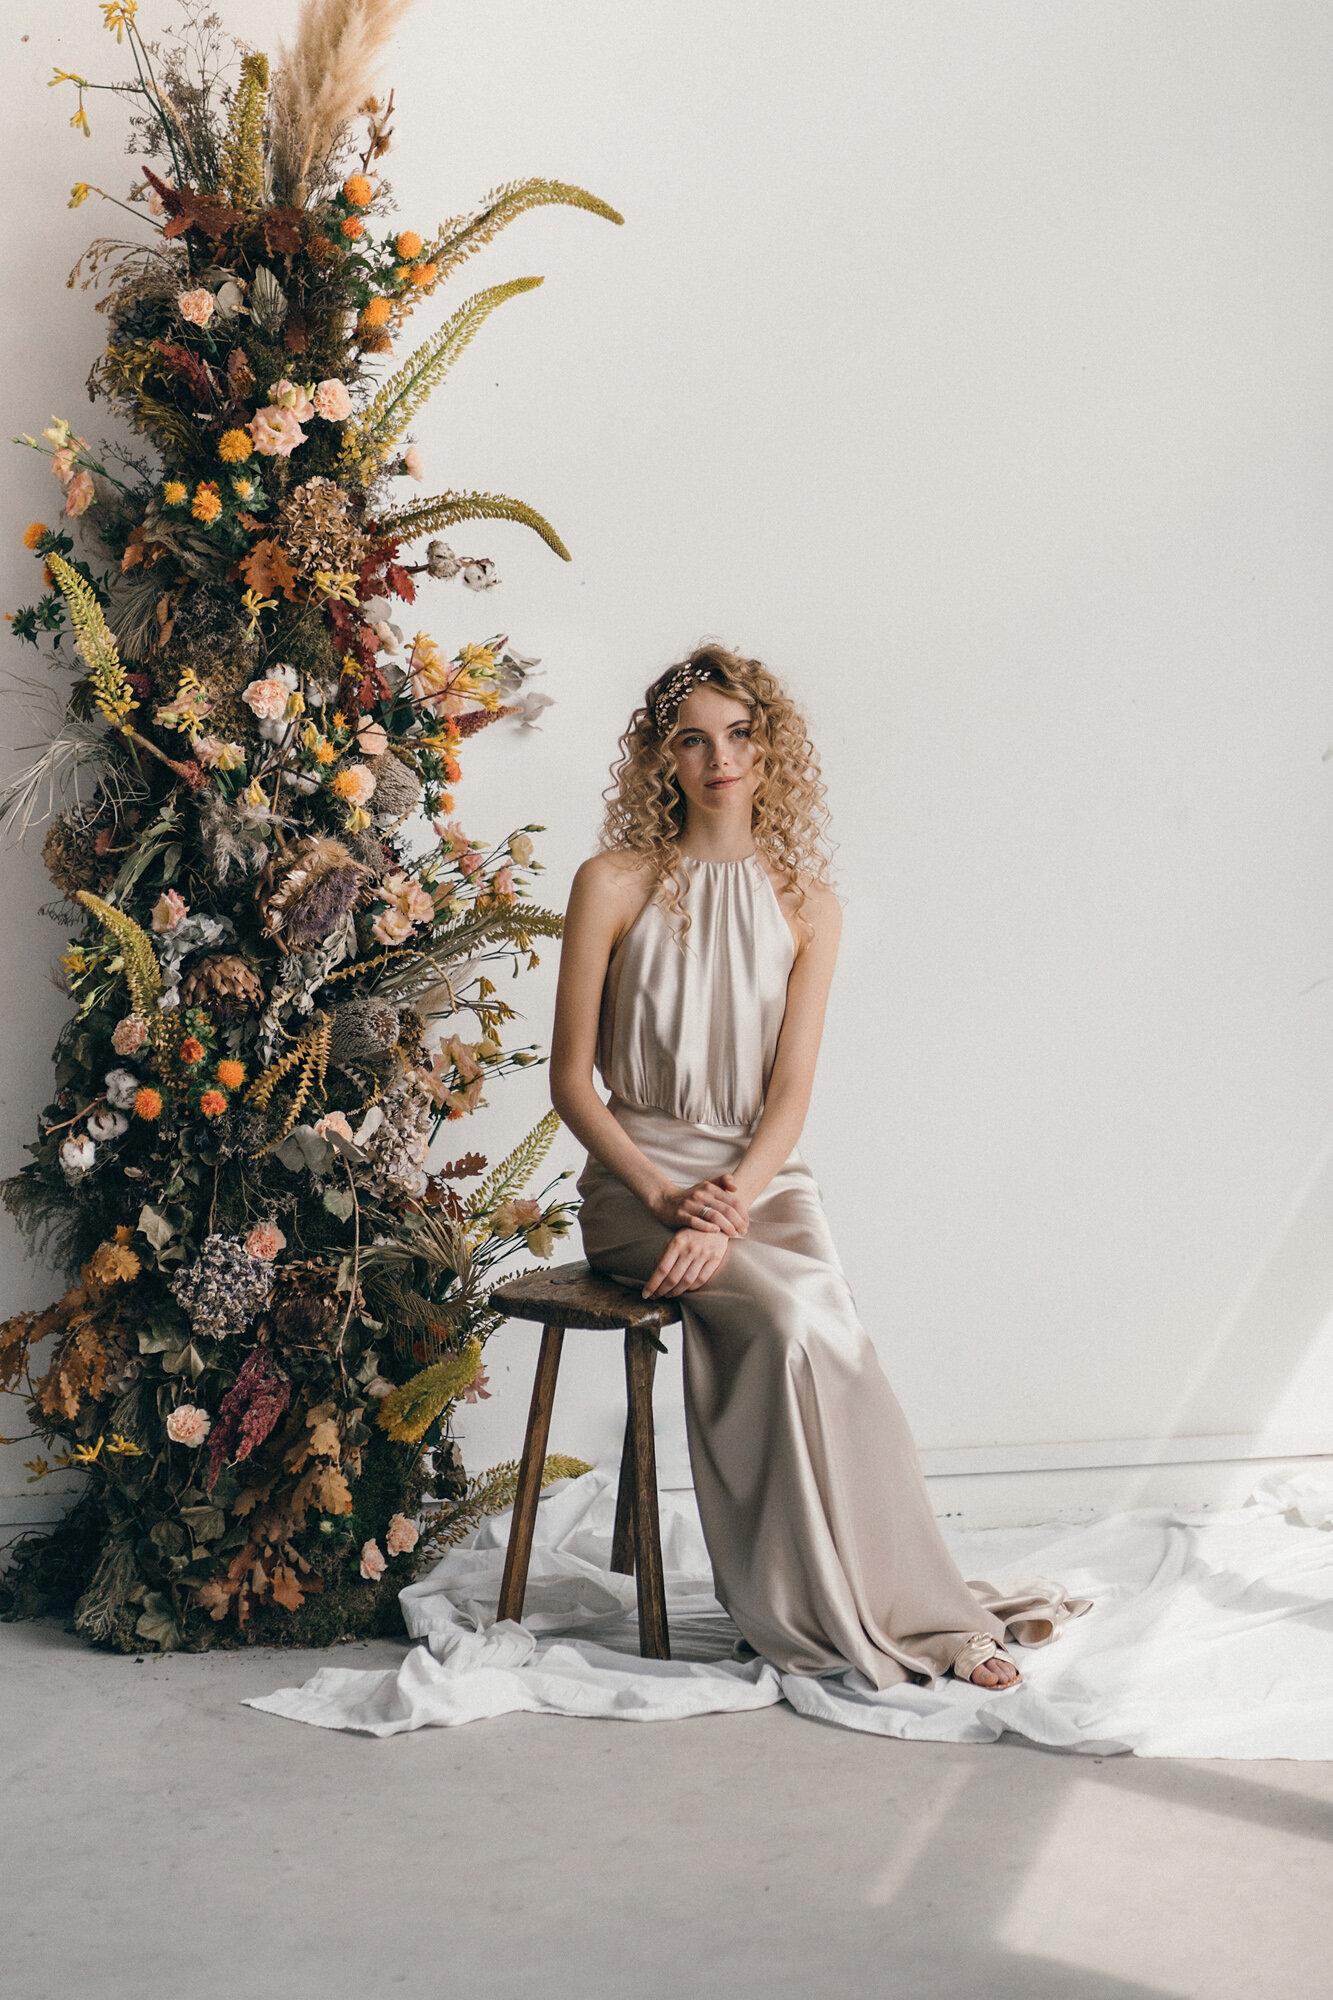 Debbie-Carlisle-Bridal-Accessories-Kate-Beaumont-Wedding-Gowns-Sheffield-Yorkshire-UK-5.jpg